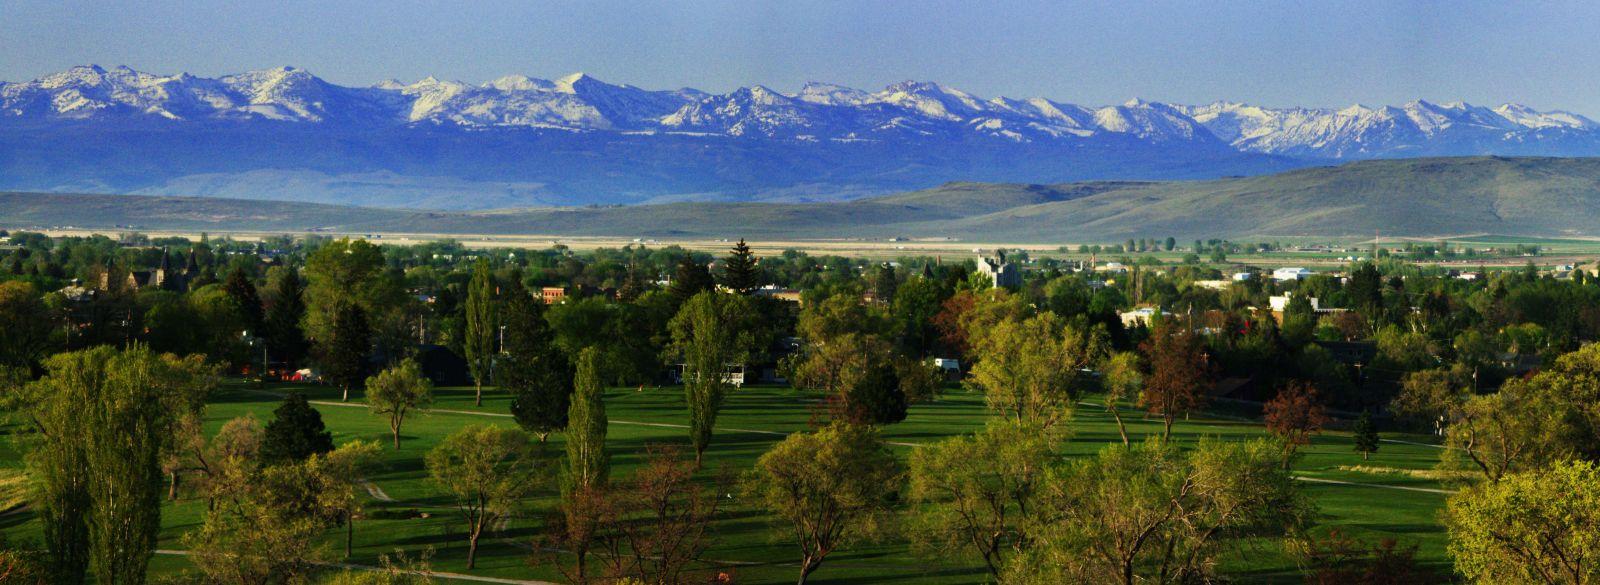 Baker City Oregon